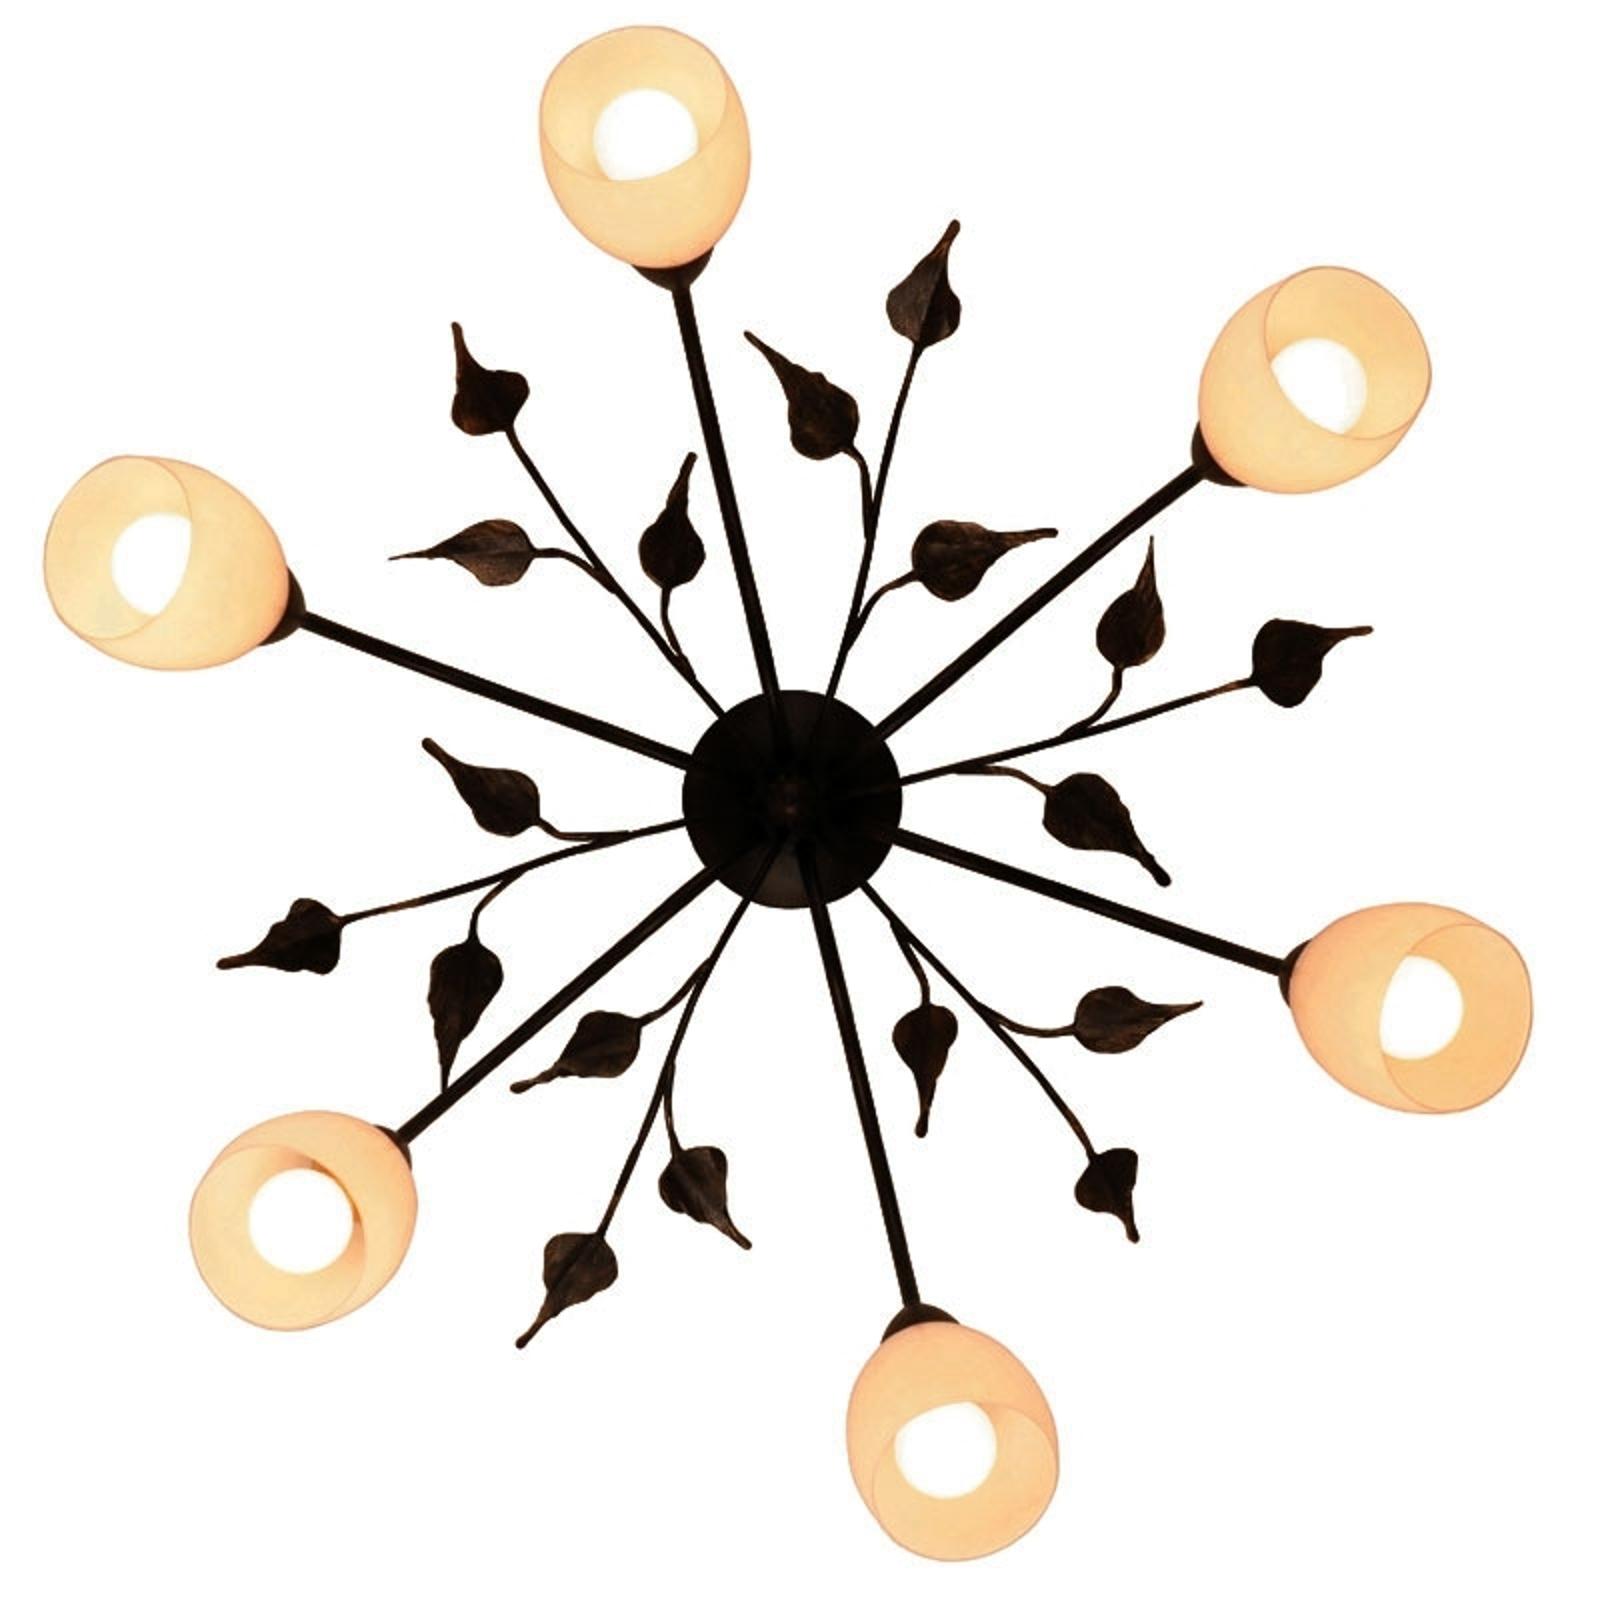 Floral plafondlampa CHALEET med tulpanglaskupor